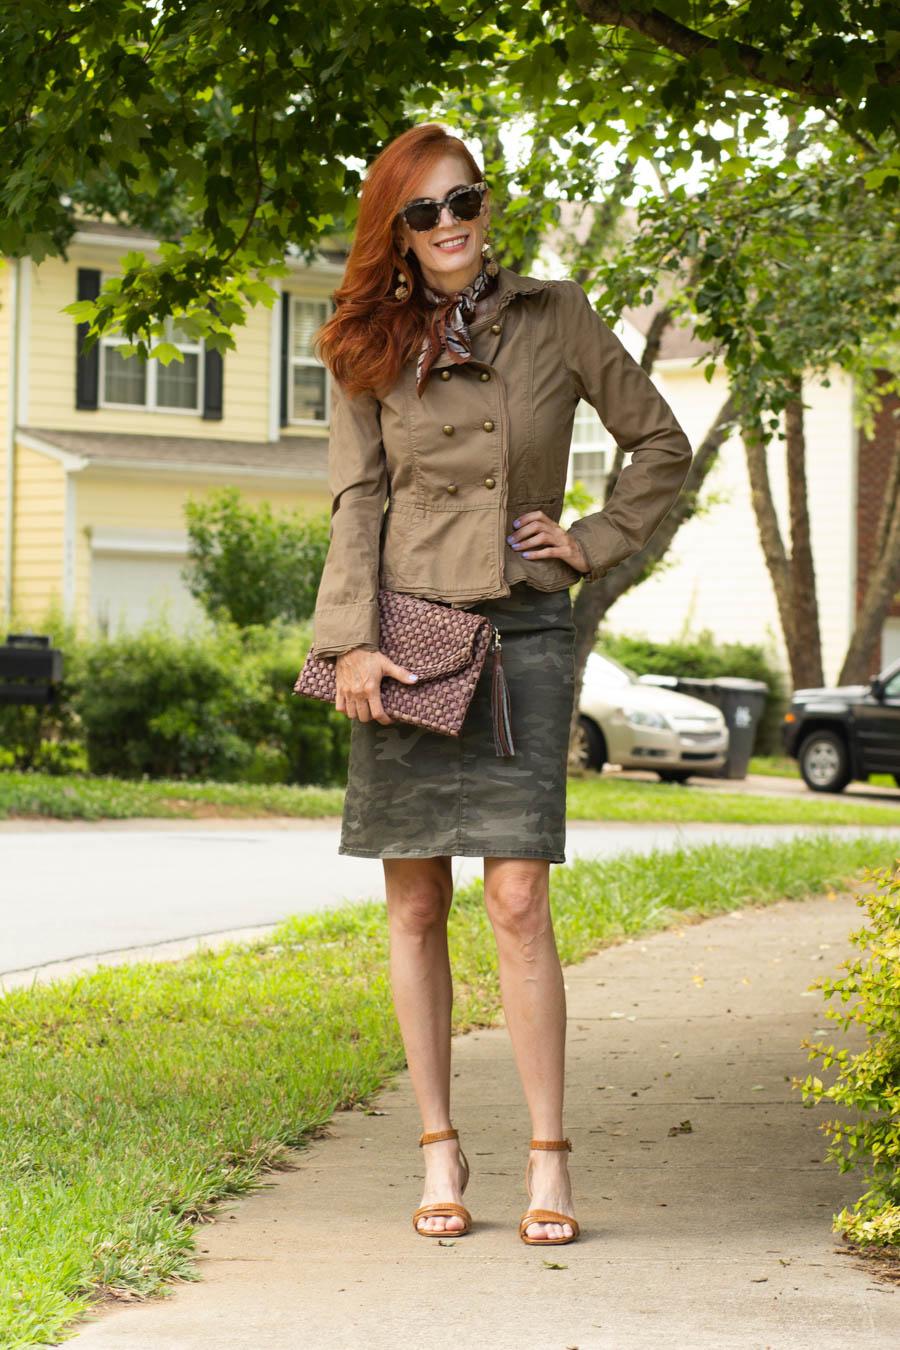 Military jacket and camo skirt